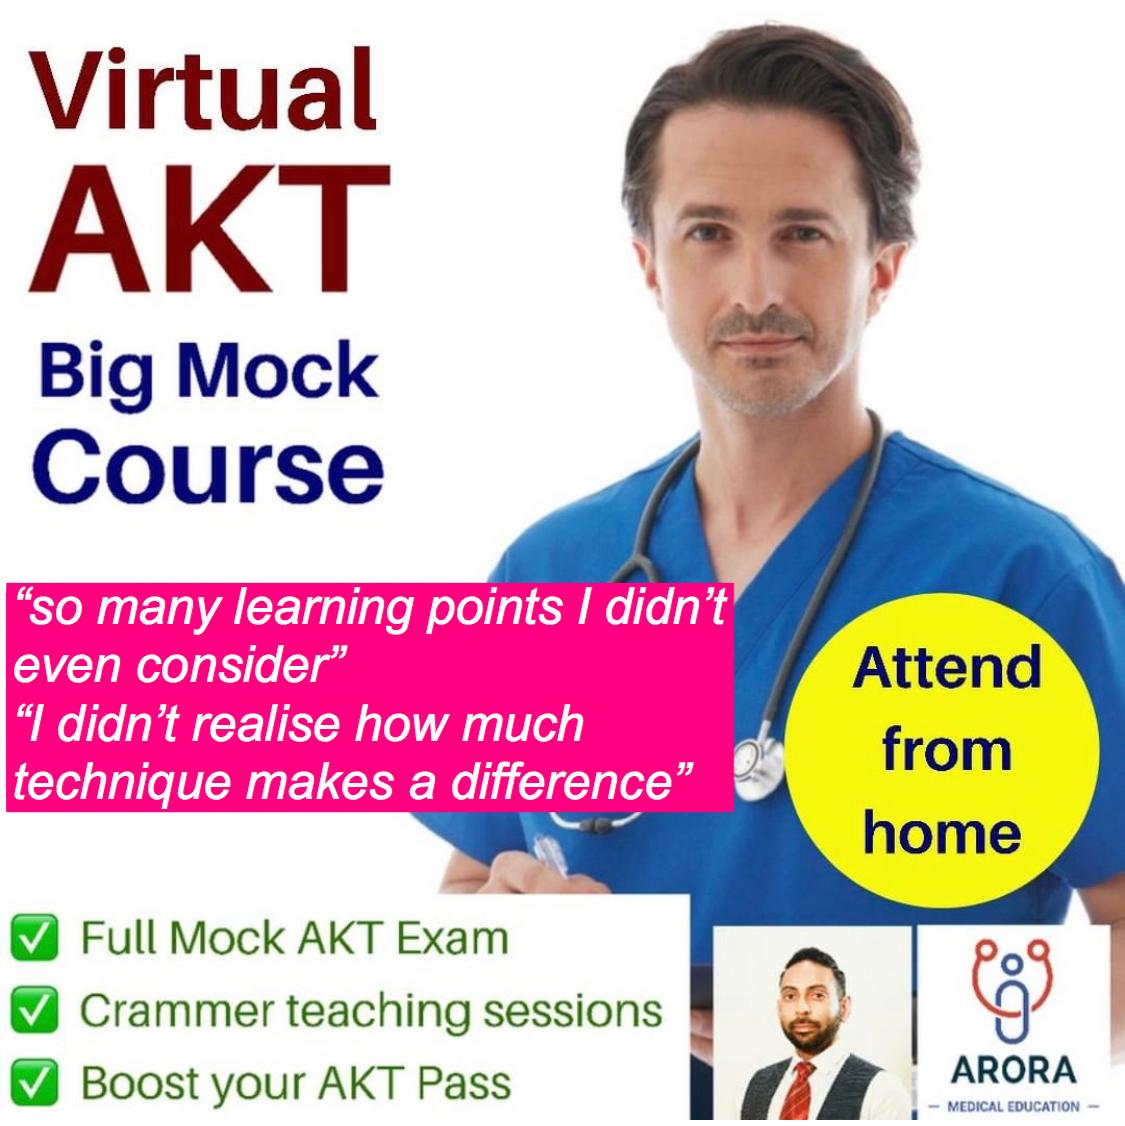 image1 6 - MRCGP CSA, AKT and PLAB Exam Courses and Online Webinars - Arora Medical Education